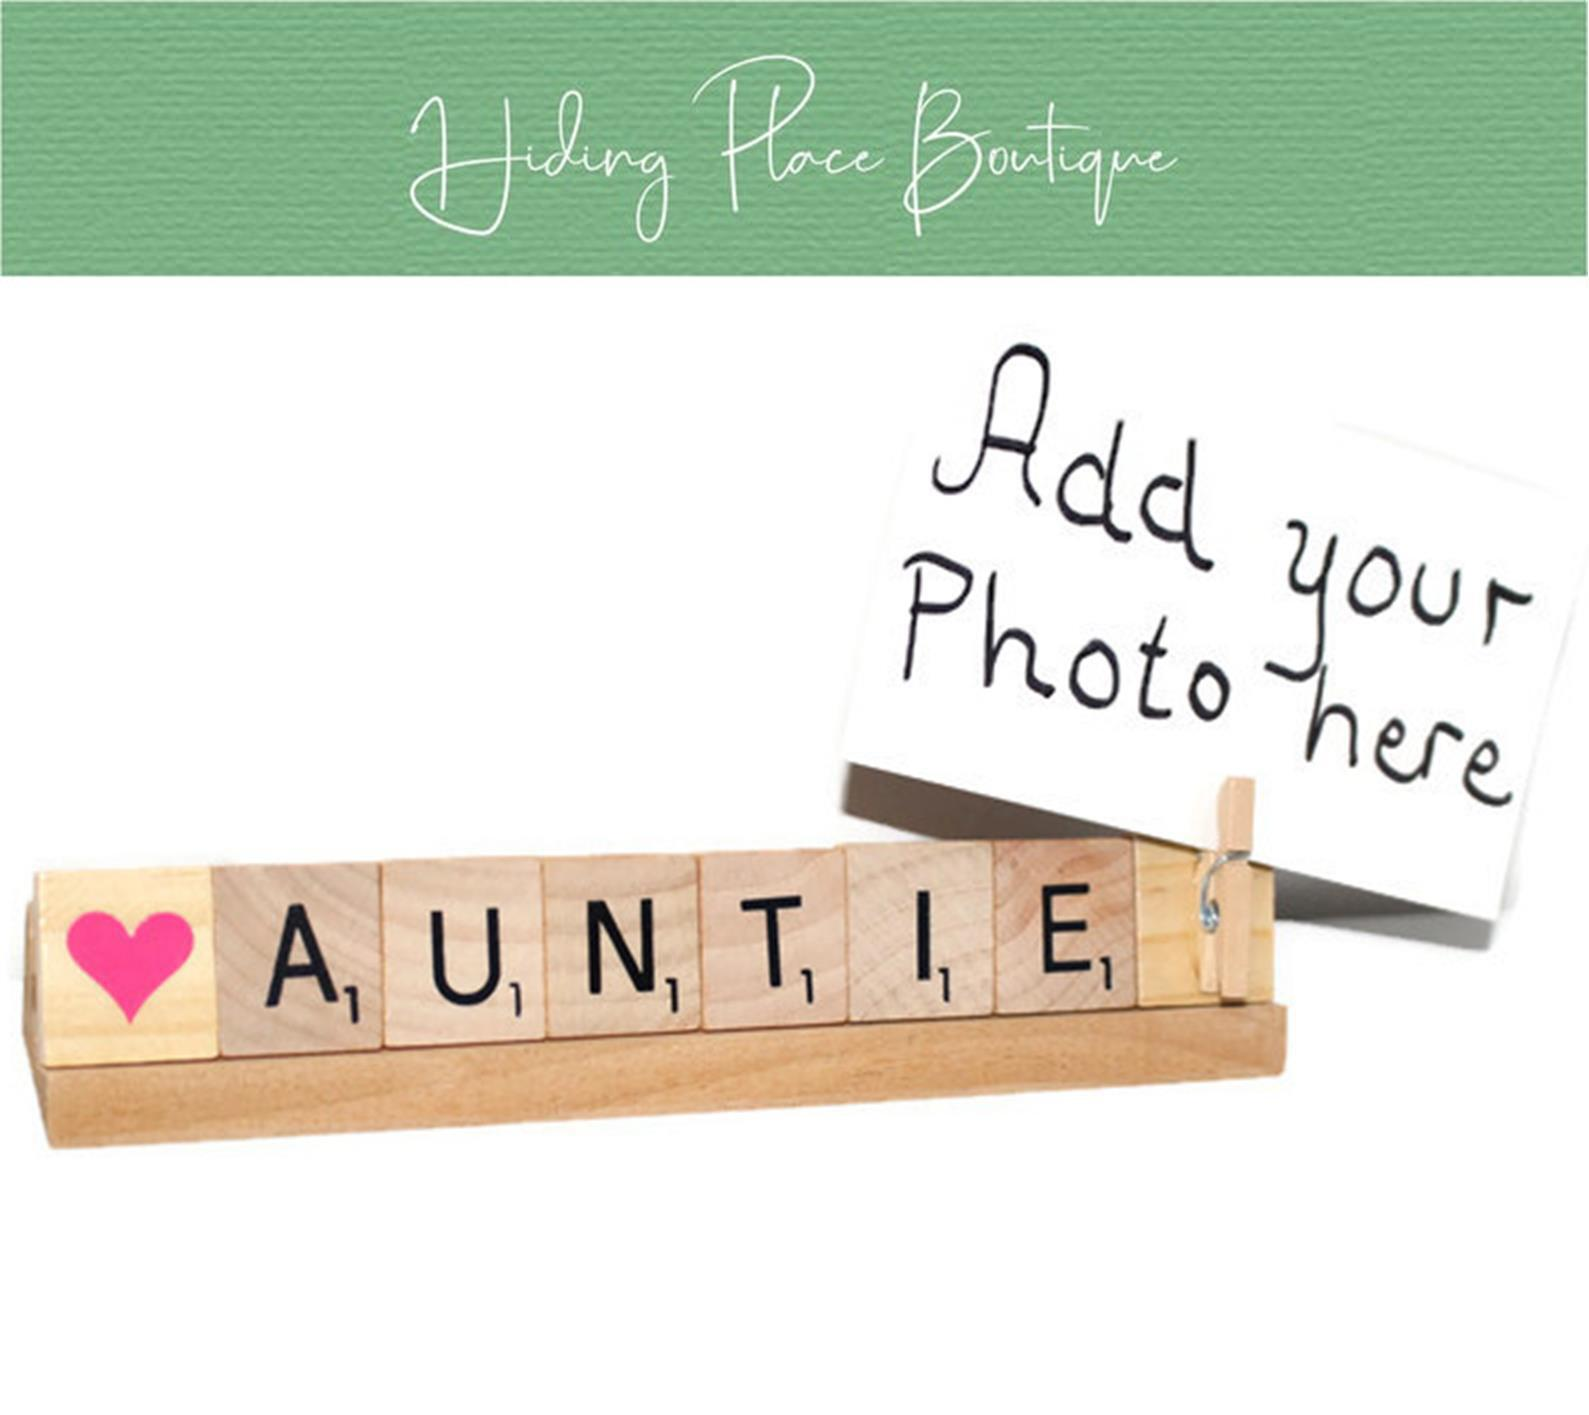 auntie photo frame